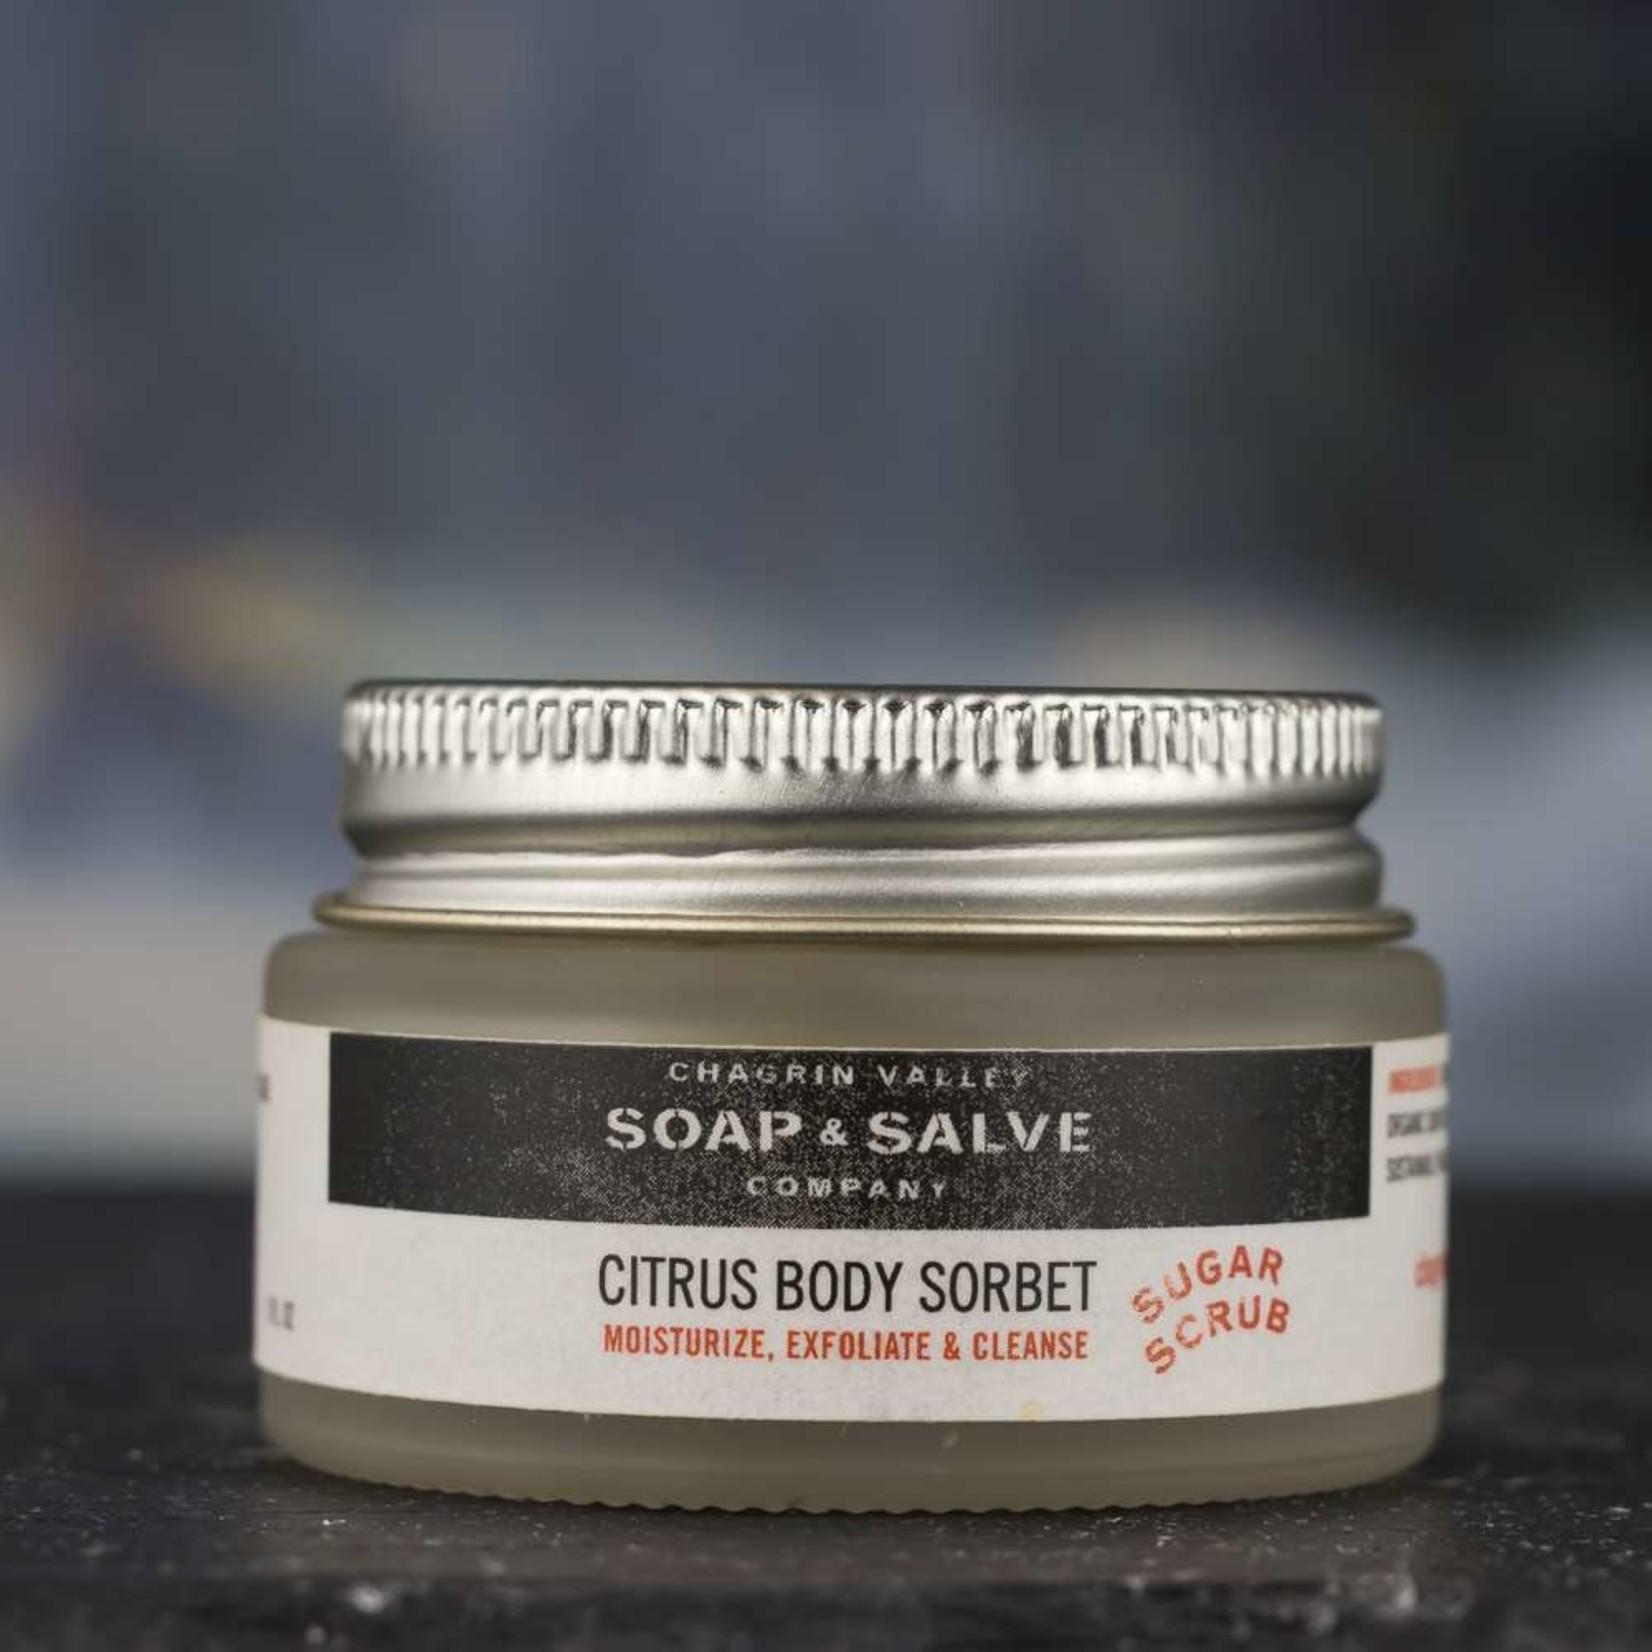 Chagrin Valley Soap and Salve Citrus & Sugar Body Cleansing Scrub 1oz tub